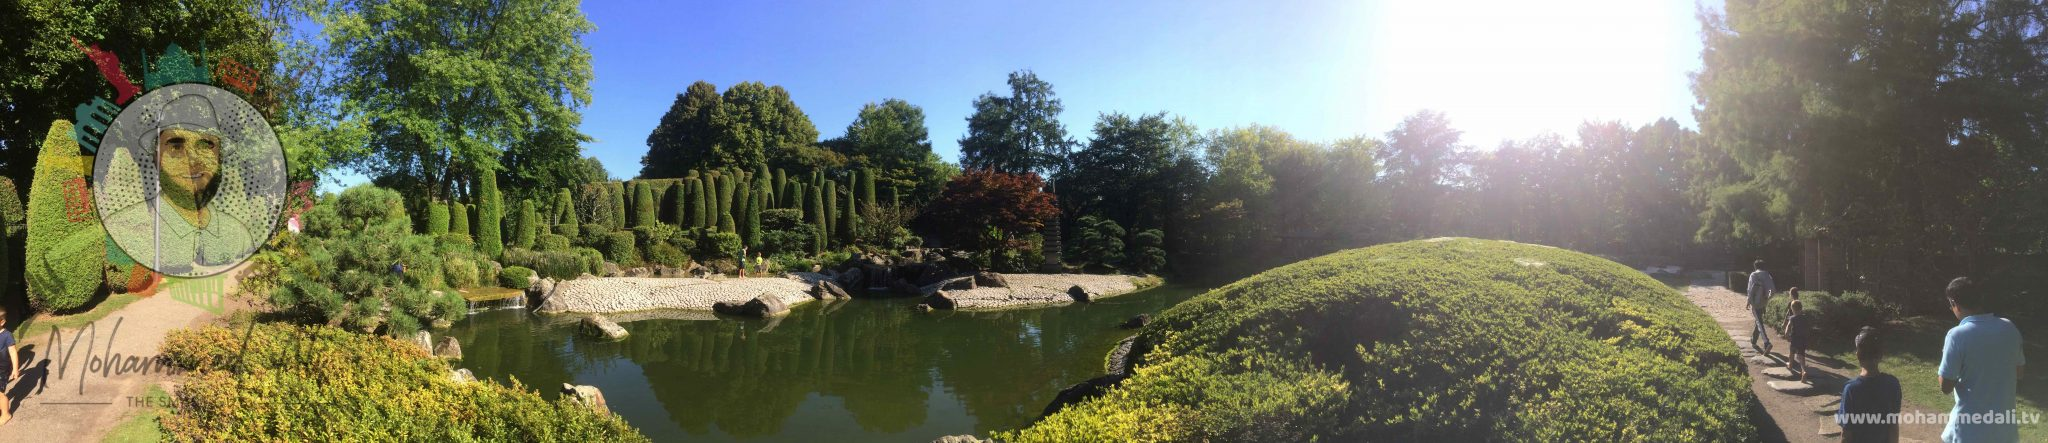 Amazing Japanese Garden in the Bonner Rheinaue in Germany